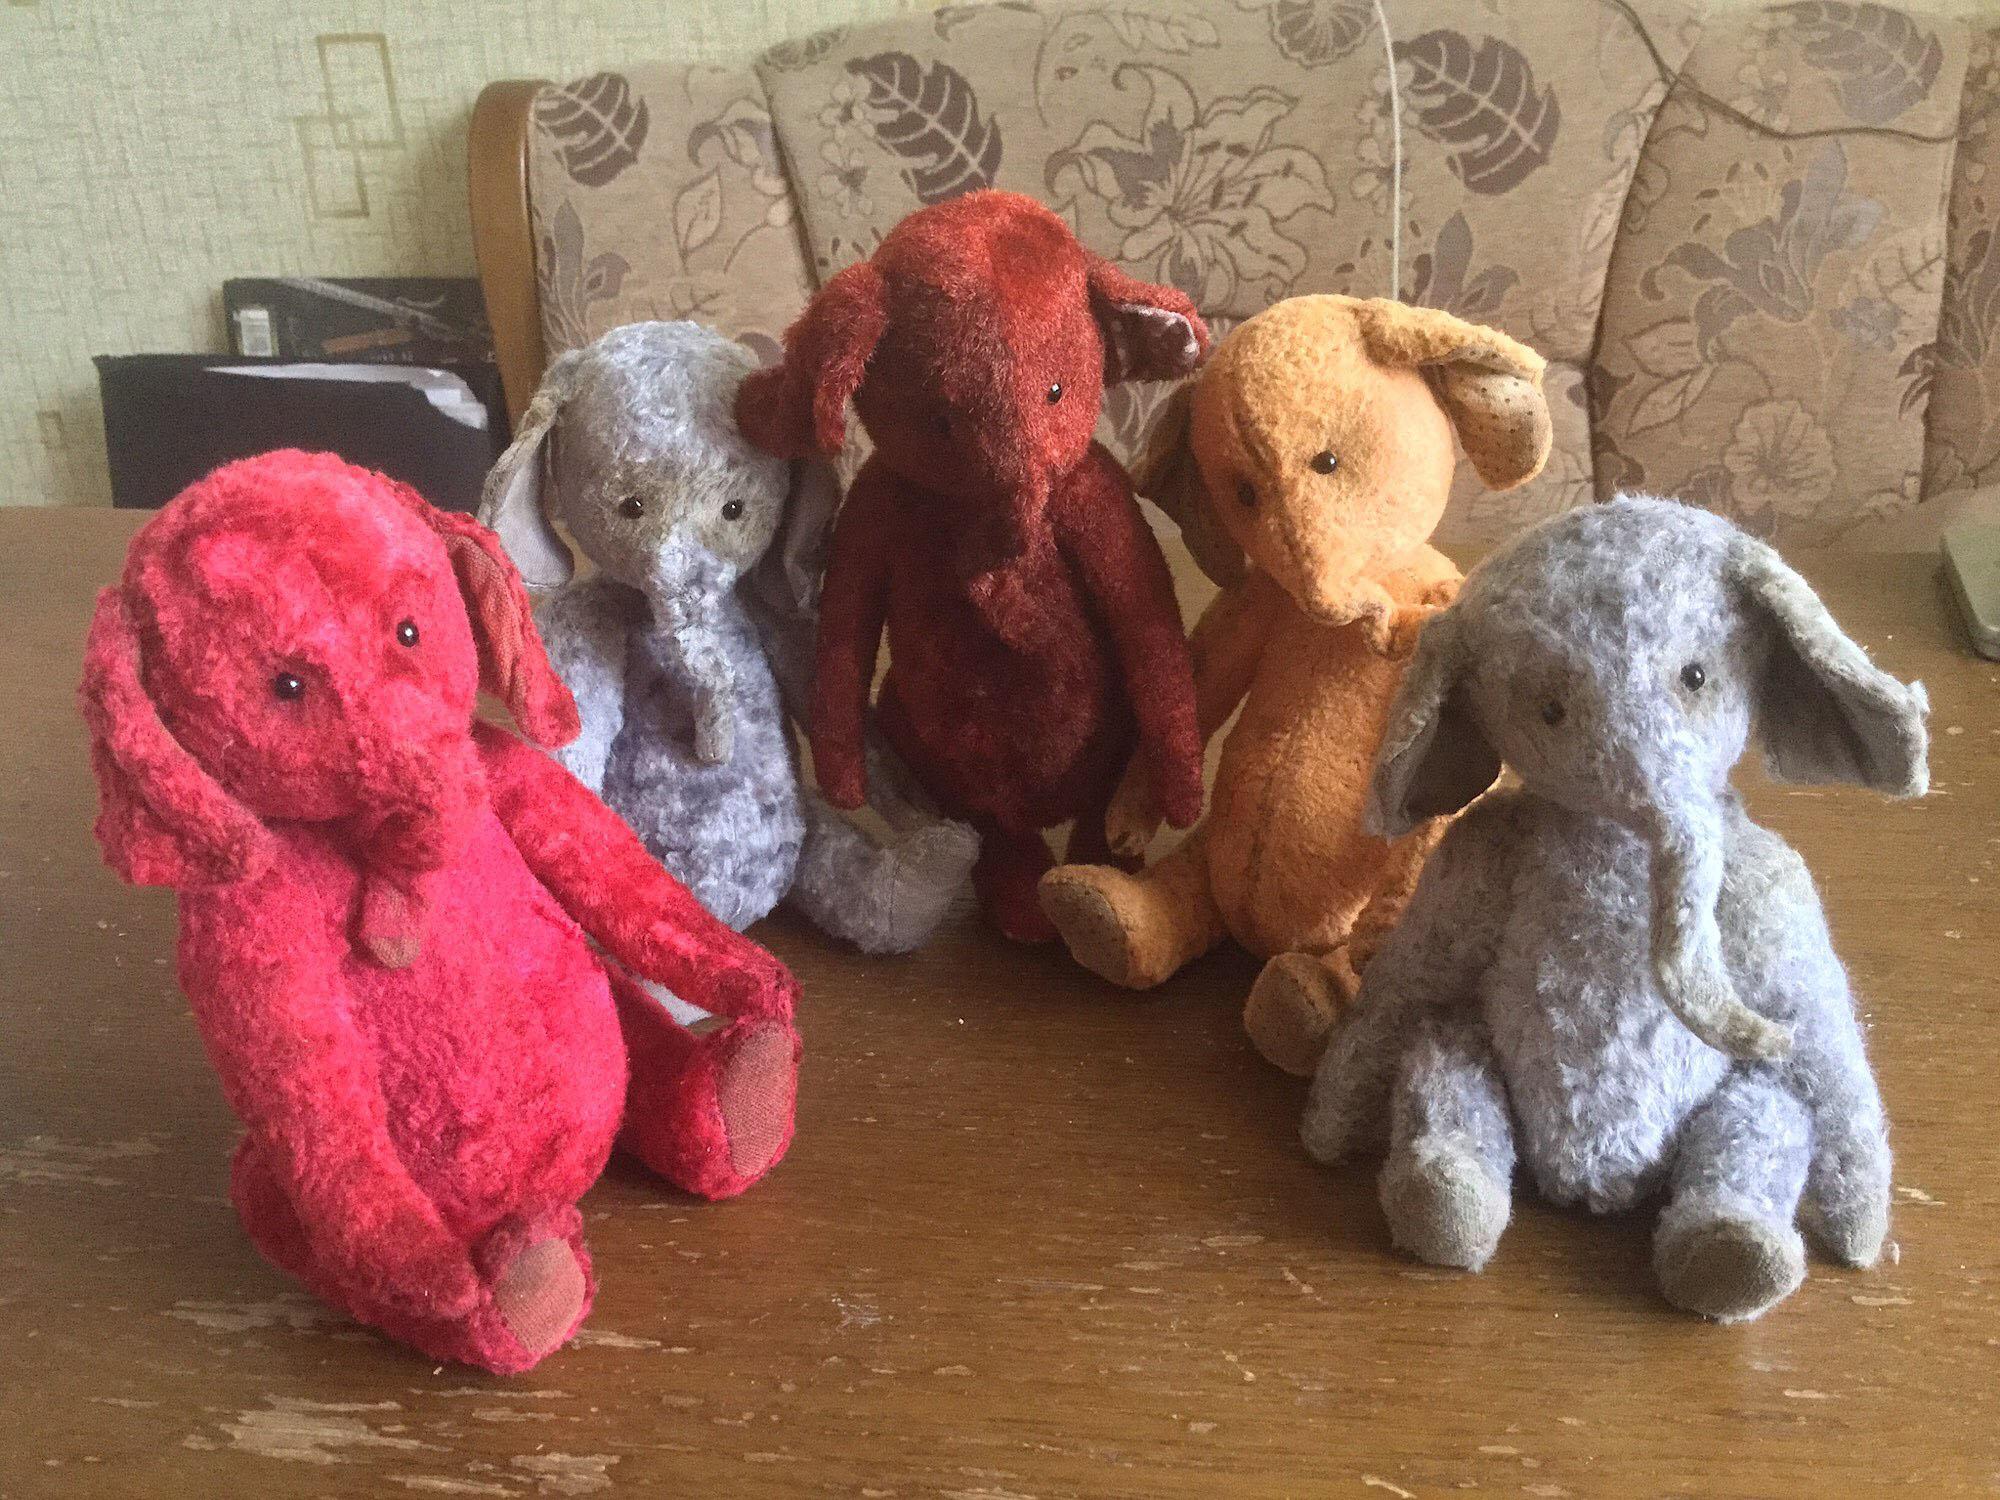 elephants_3-1.jpg